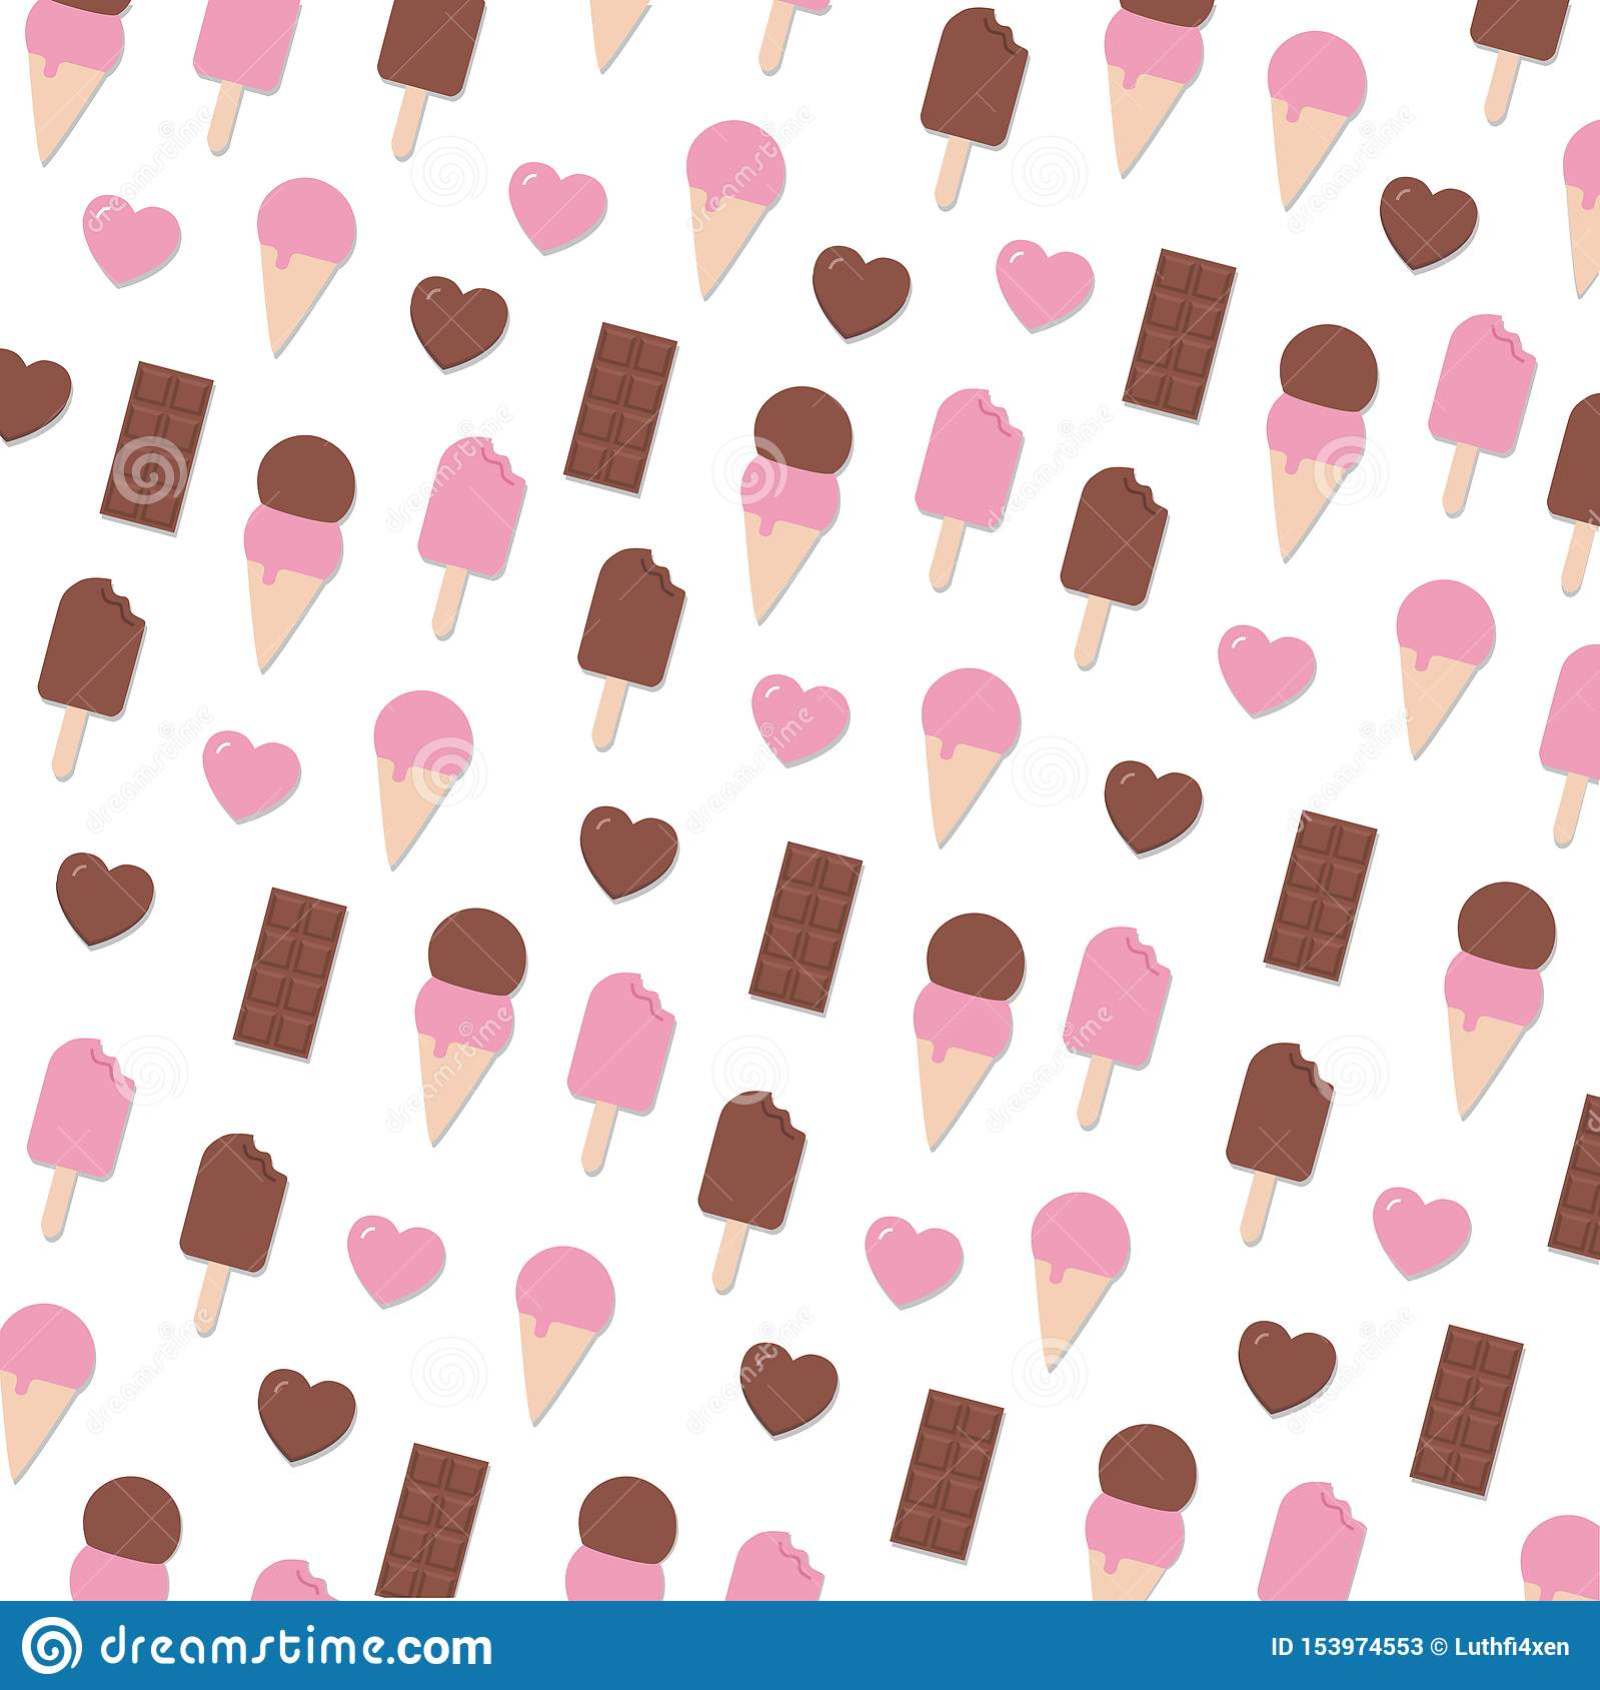 Suposición Valentine Day Seamless Pattern